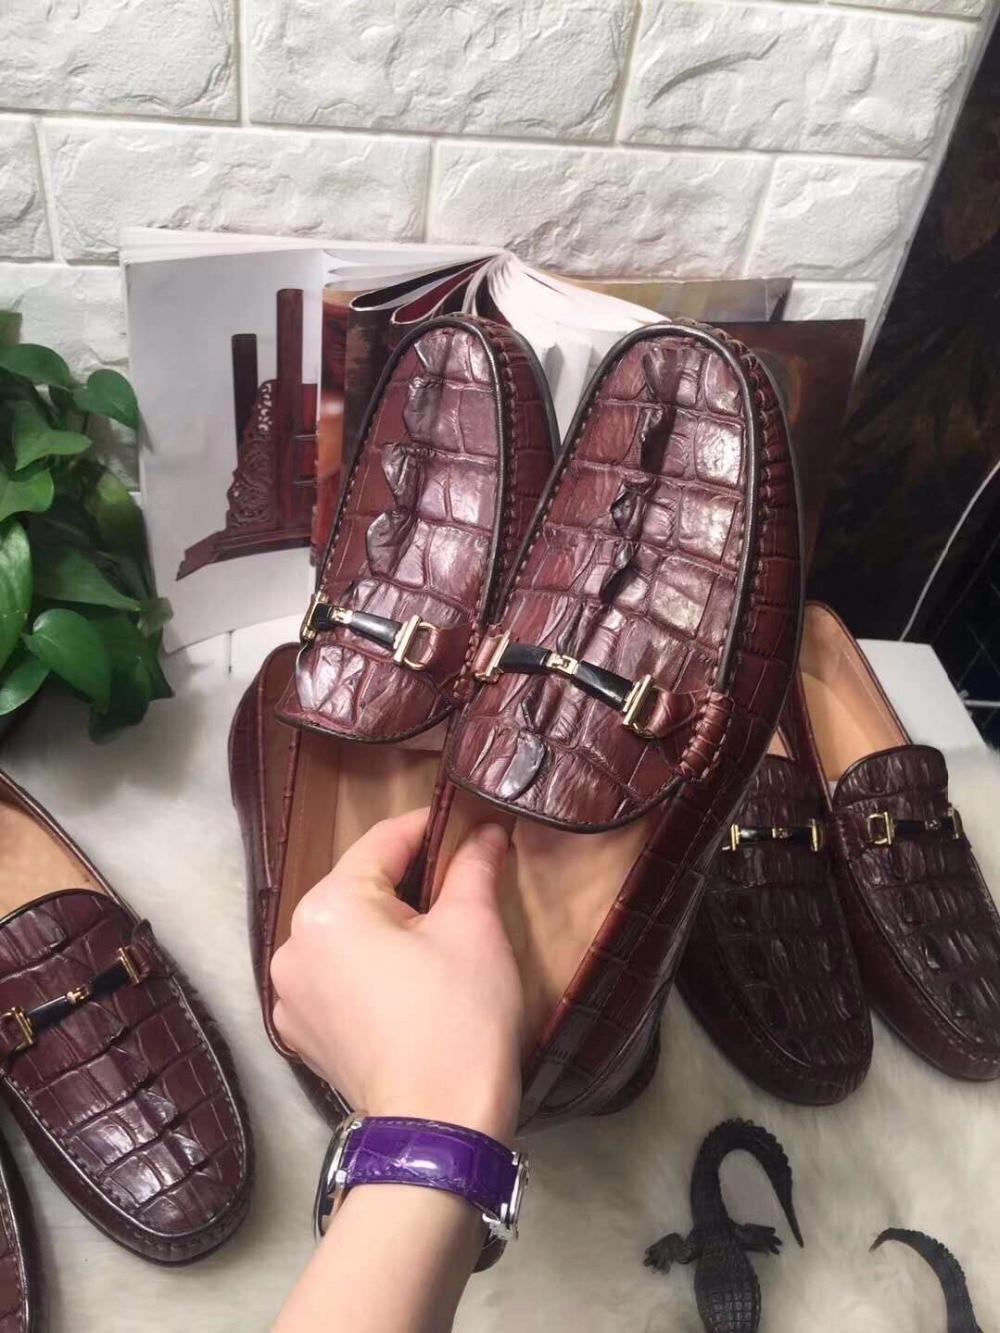 Pele Homens Durável Crocodilo Genuíno Sapato Negócios Sólida 2018 Genuine Superior De Lazer Qualidade Cauda Volta Real wqAx78XxY